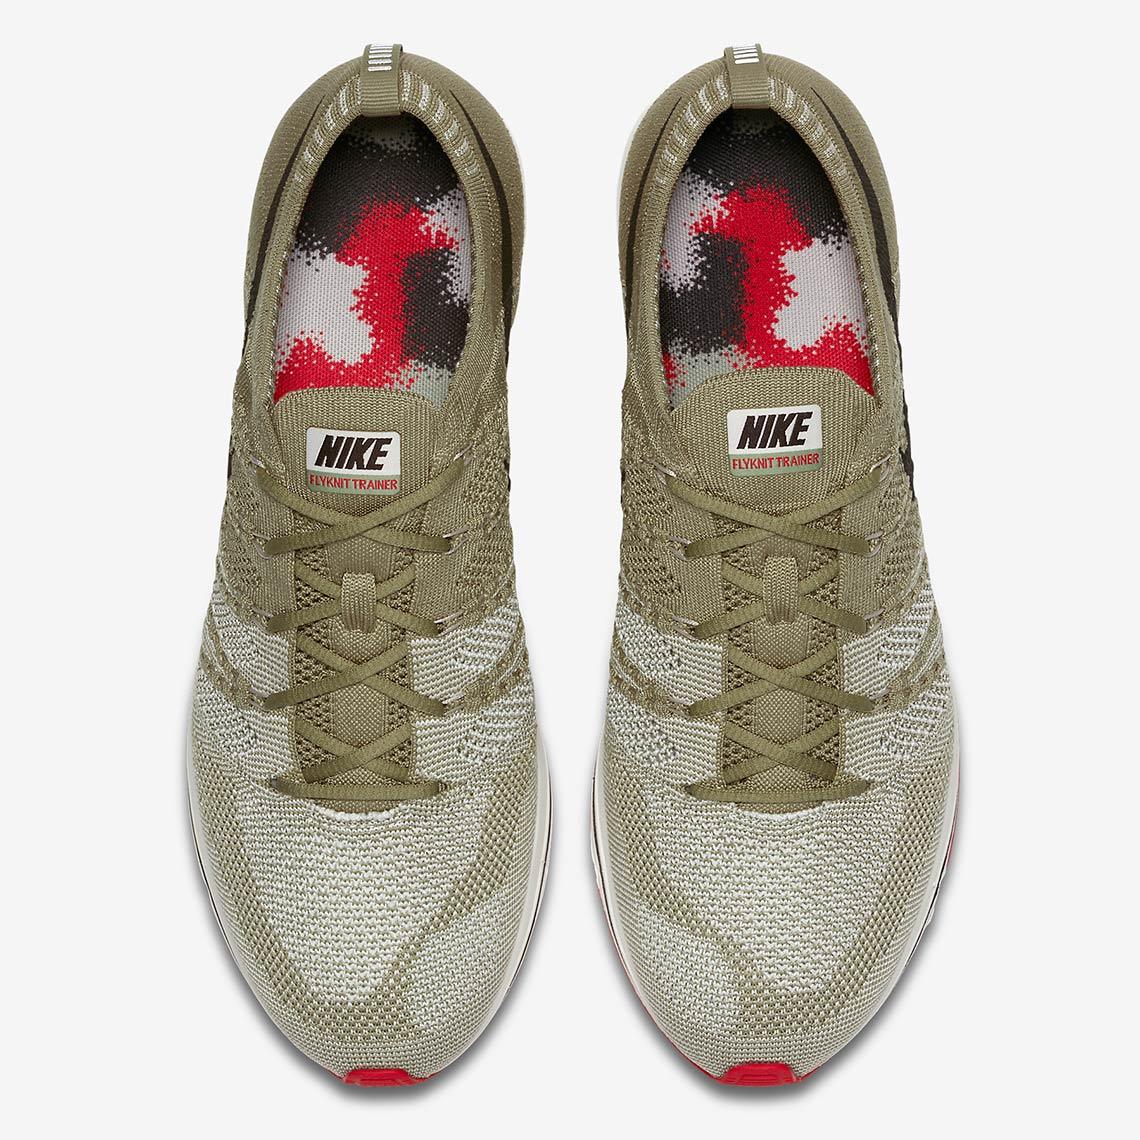 0097dc6cd4605 Nike Flyknit Trainer